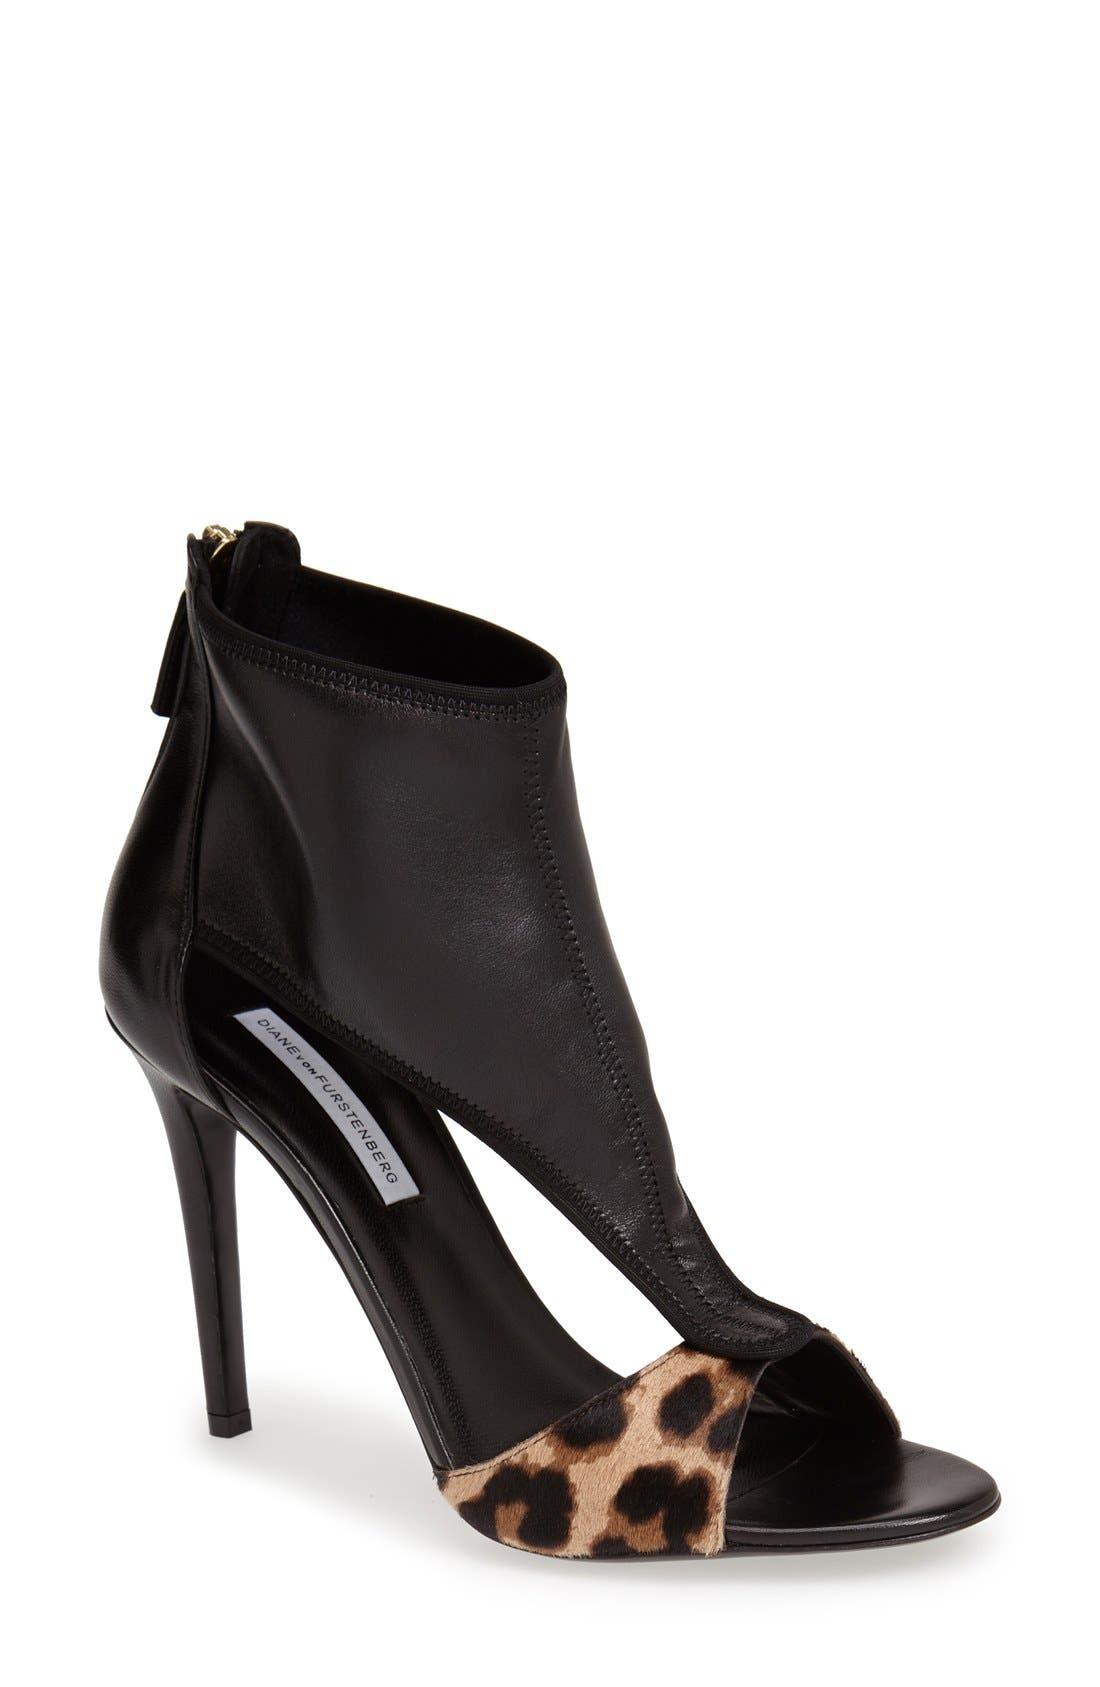 Alternate Image 1 Selected - Diane von Furstenberg 'Uffie' Leather & Calf Hair Sandal